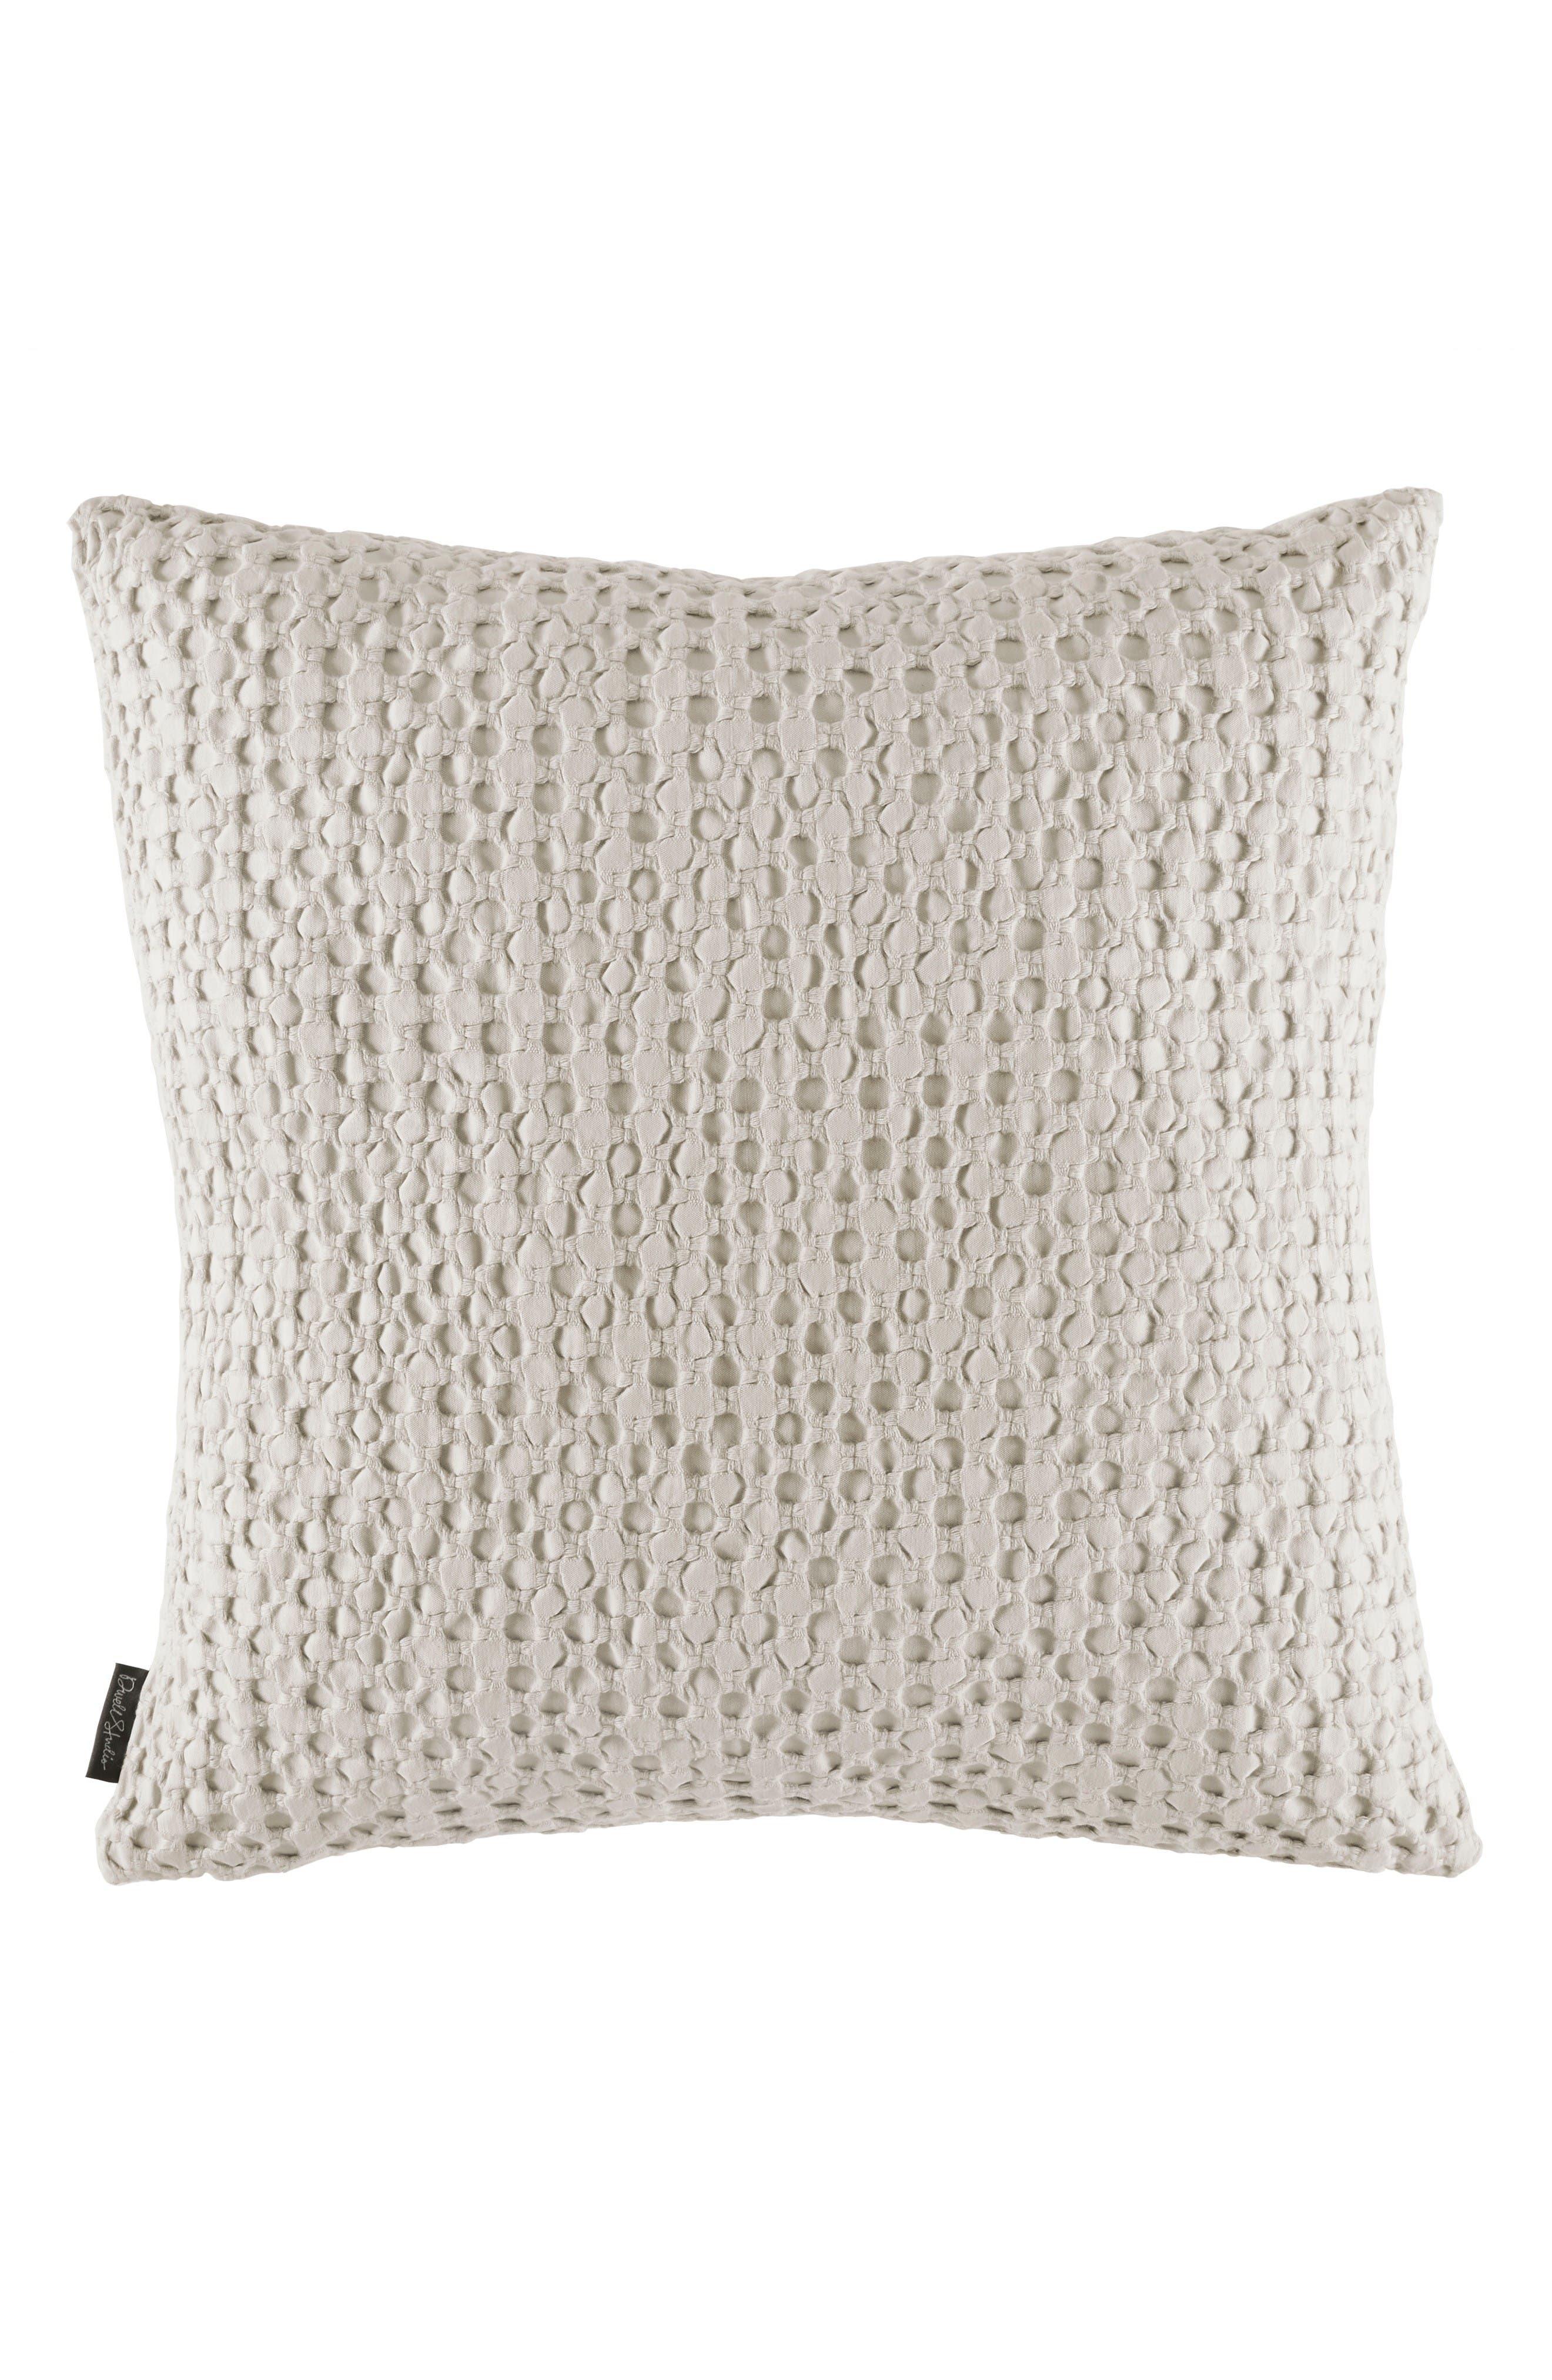 DwellStudio Thayer Accent Pillow